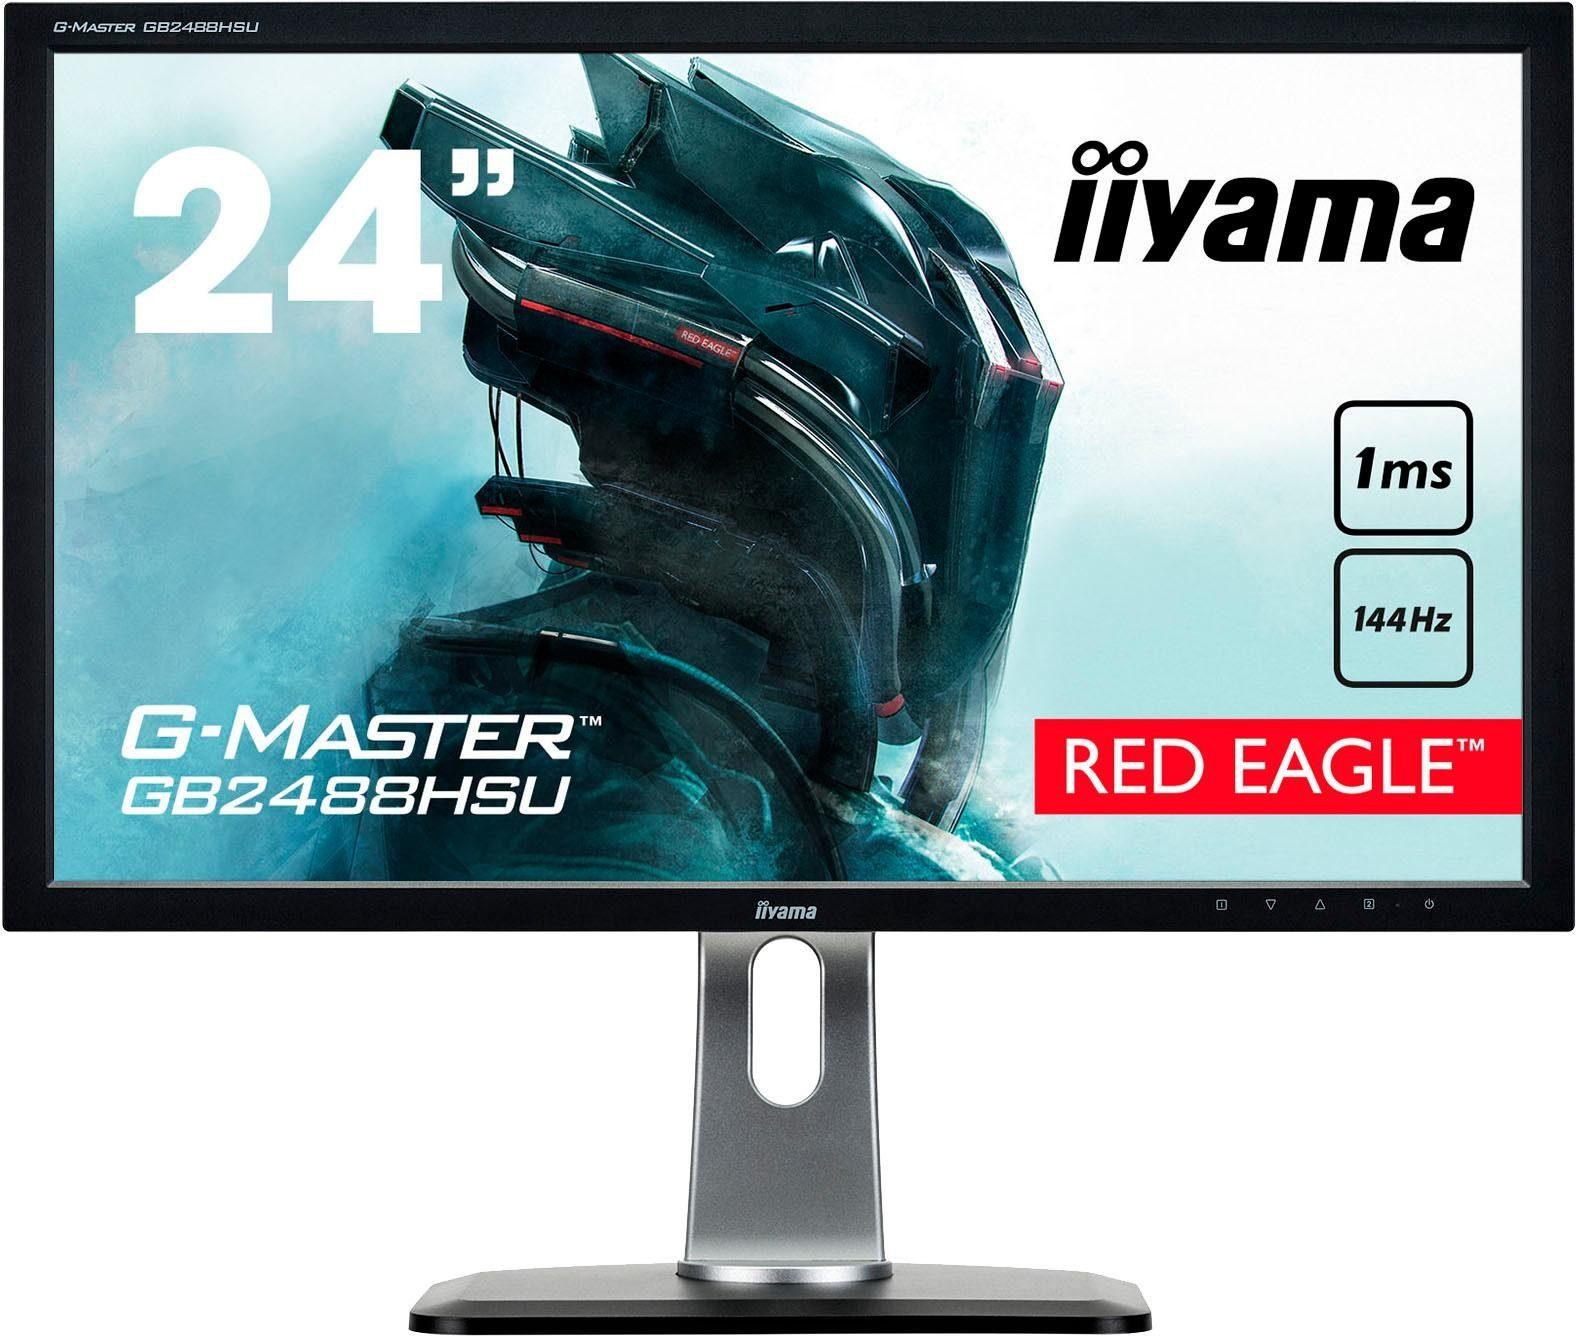 Iiyama GB2488HSU-B3 Gaming-LED-Monitor (1920 x 1080 Pixel, Full HD, 1 ms Reaktionszeit, 144 Hz)